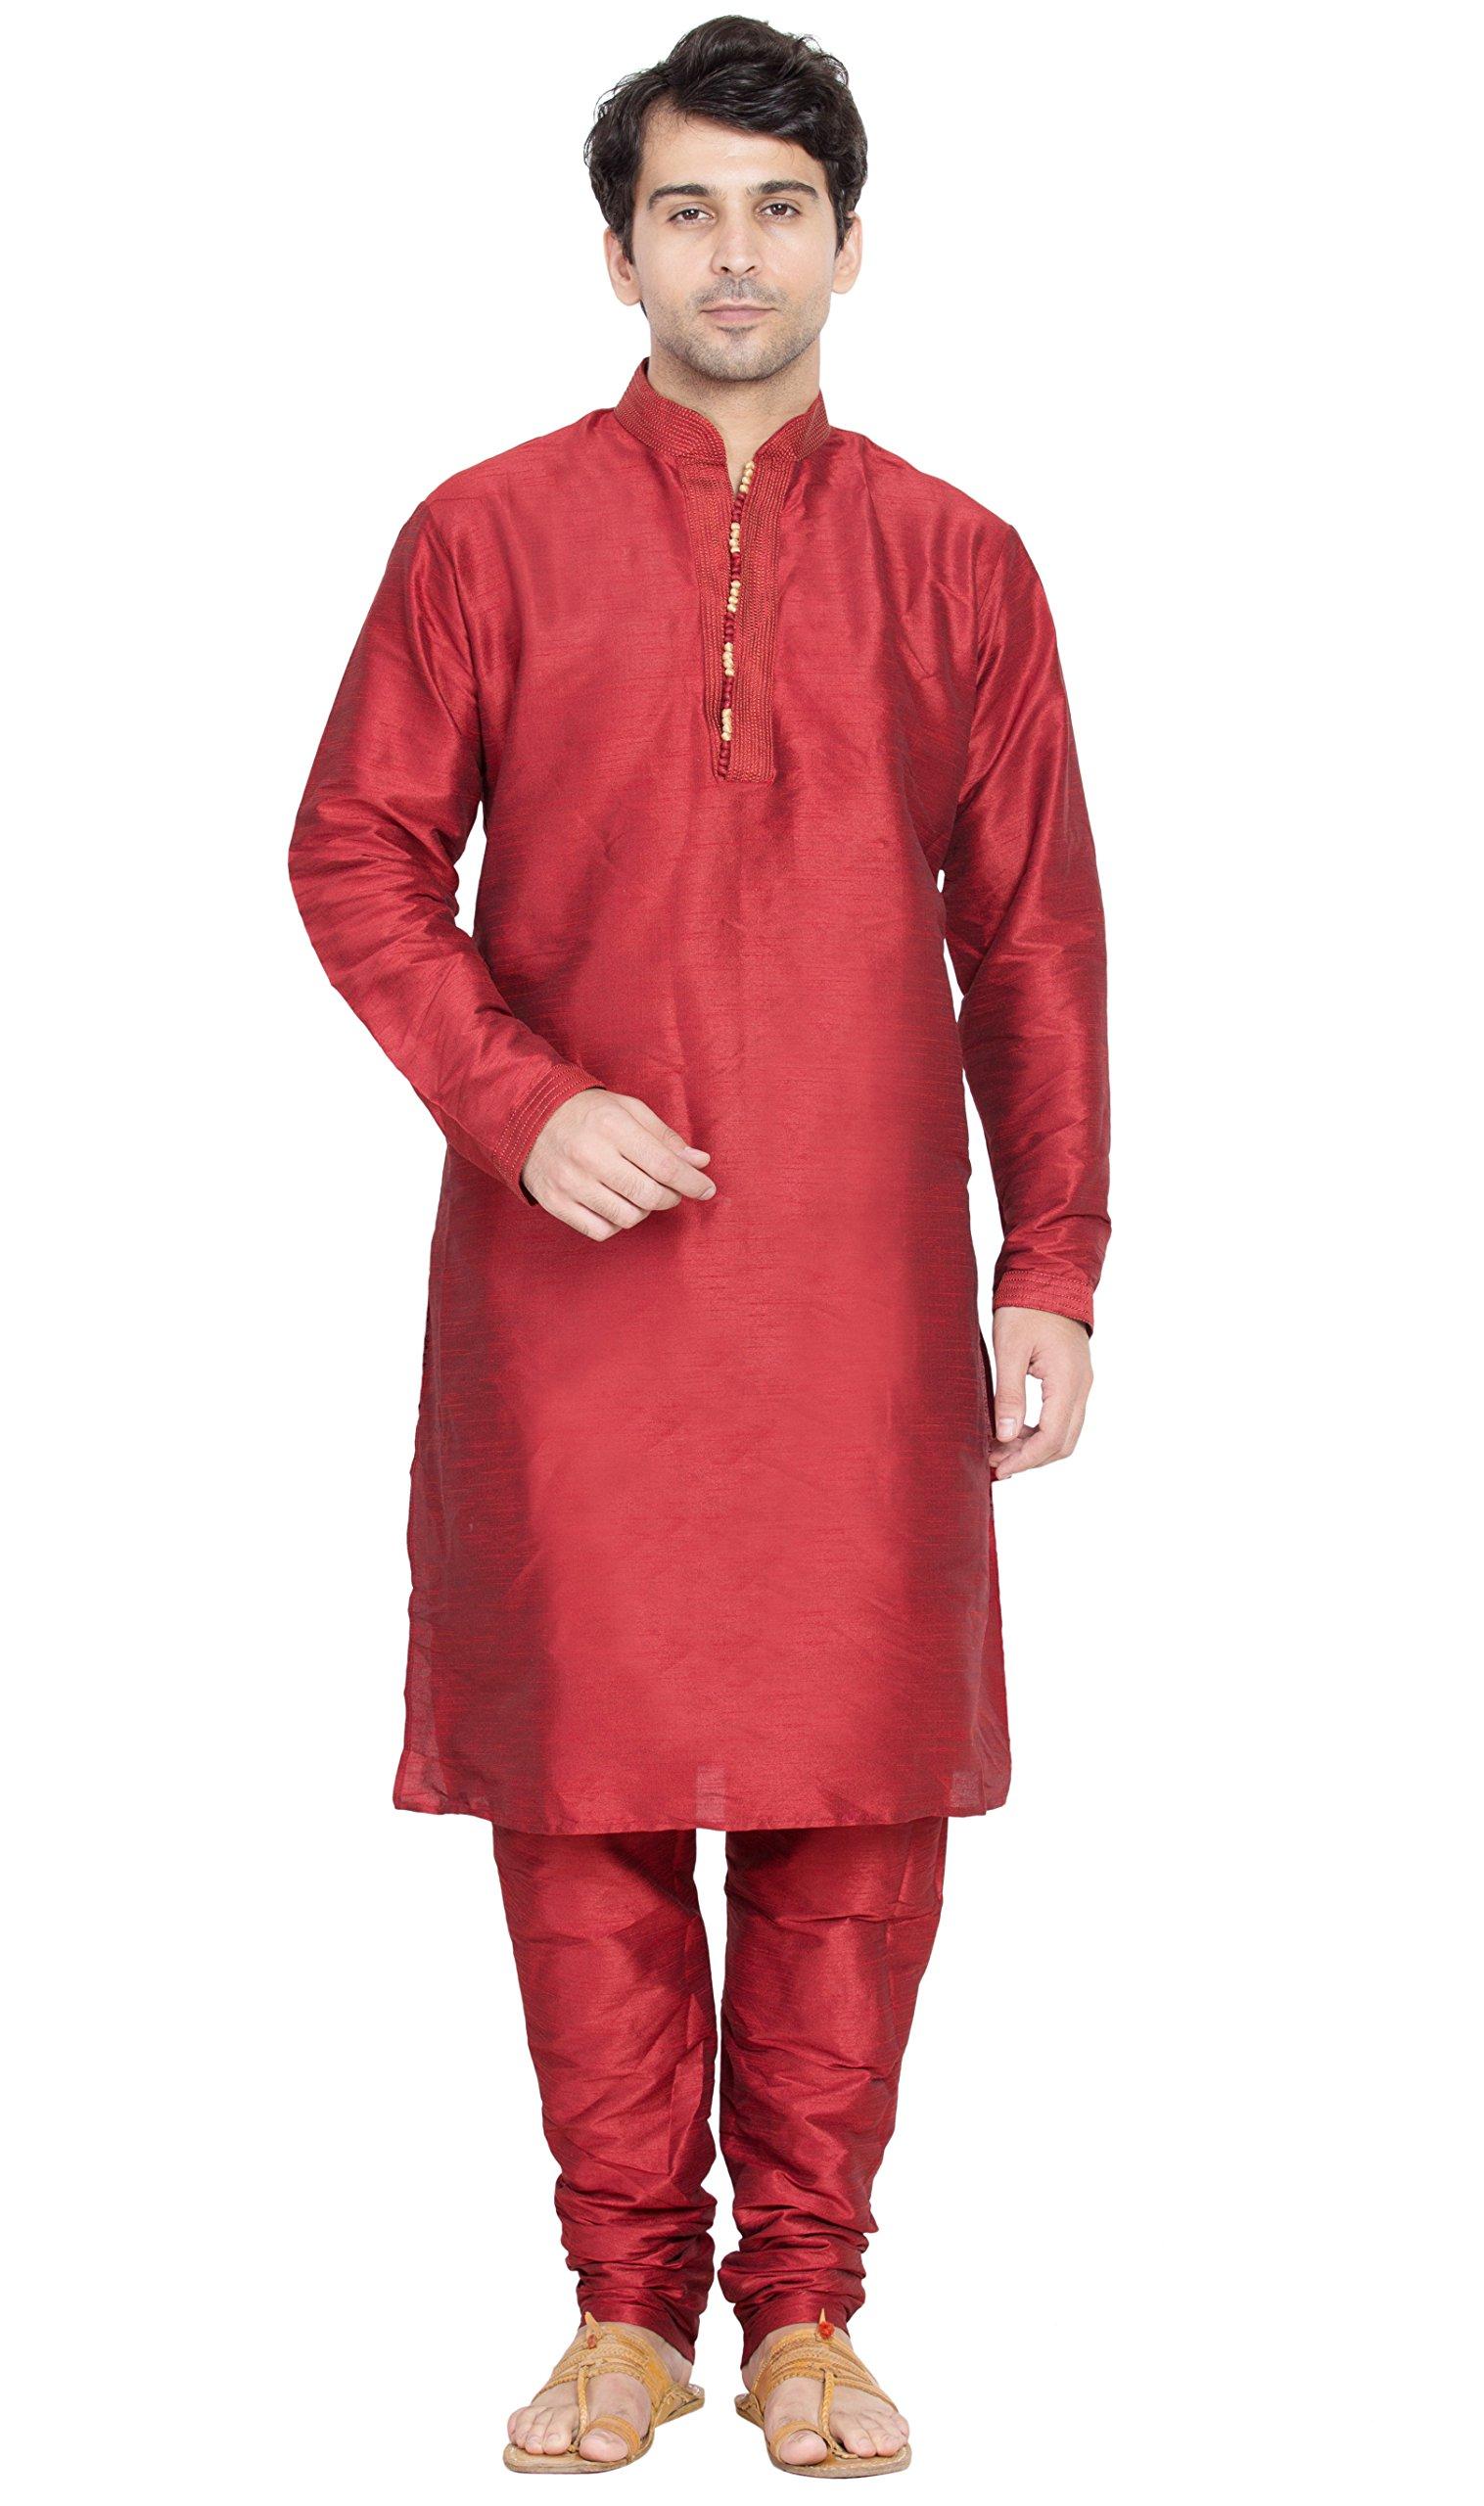 Long Sleeve Shirt Mens Long Kurta Pajama Set India Ethnic Fashion Mens Wear -M